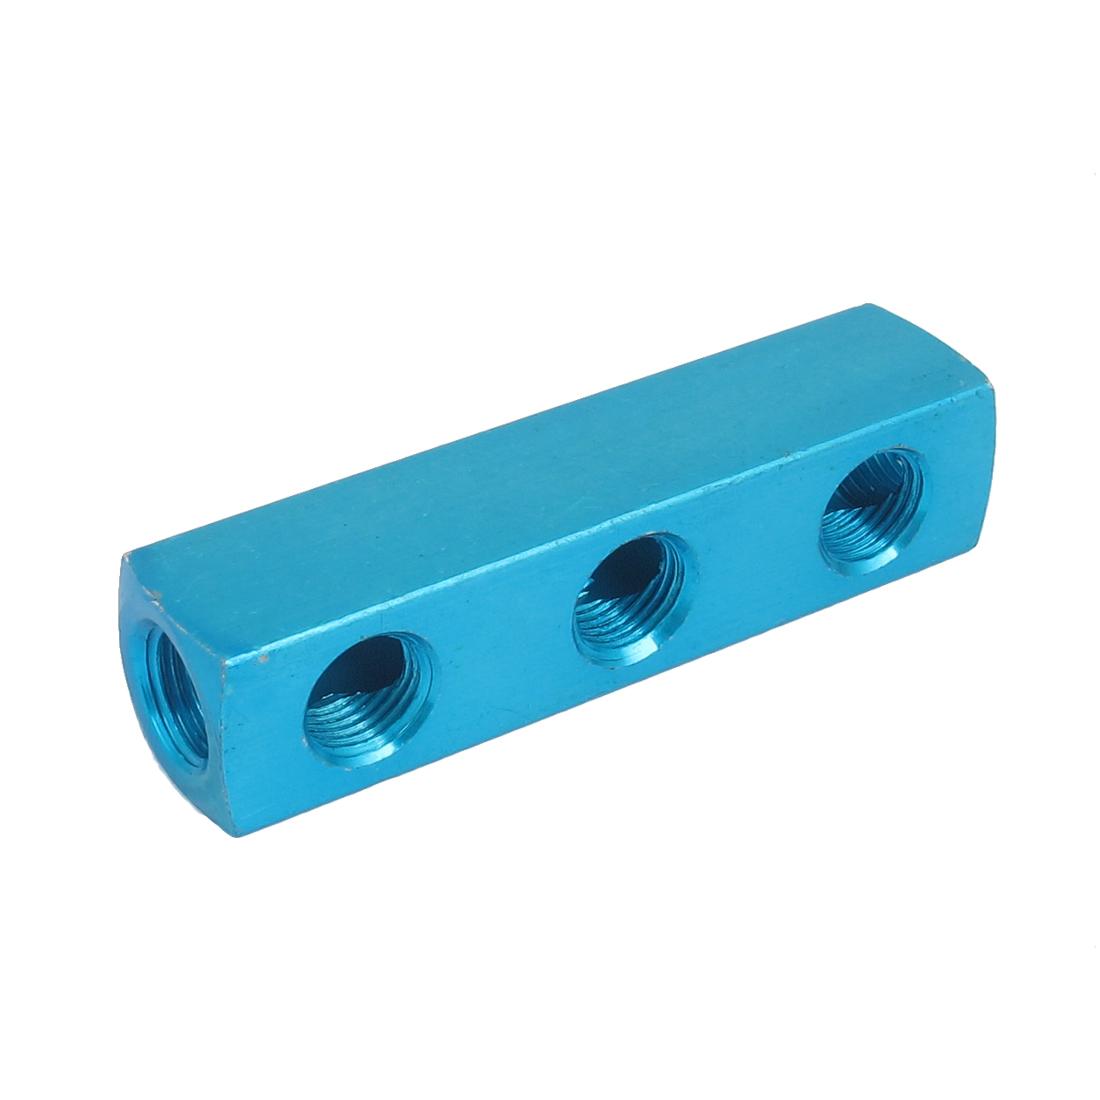 Air Compressor 1/4BSP Thread 3 Way 6 Ports Quick Connect Hose Inline Manifold Block Socket Blue